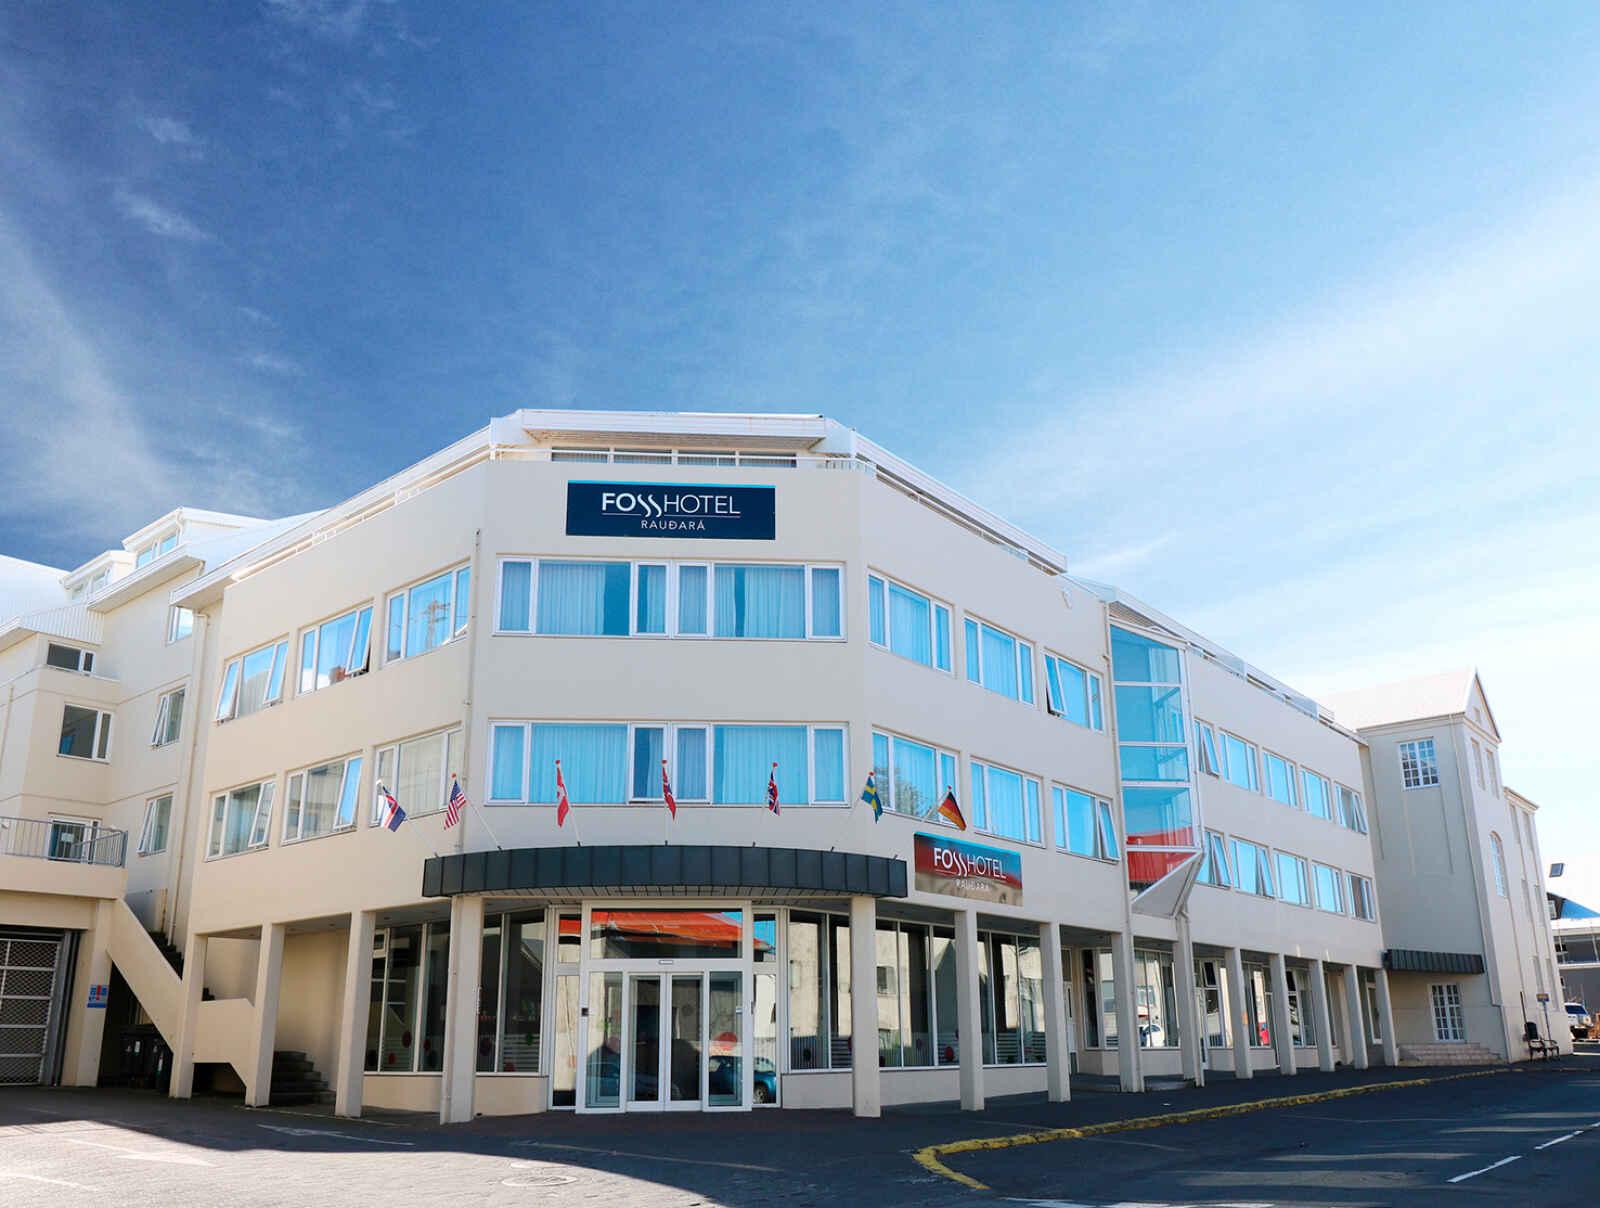 Islande - Hôtel Fosshotel Raudara